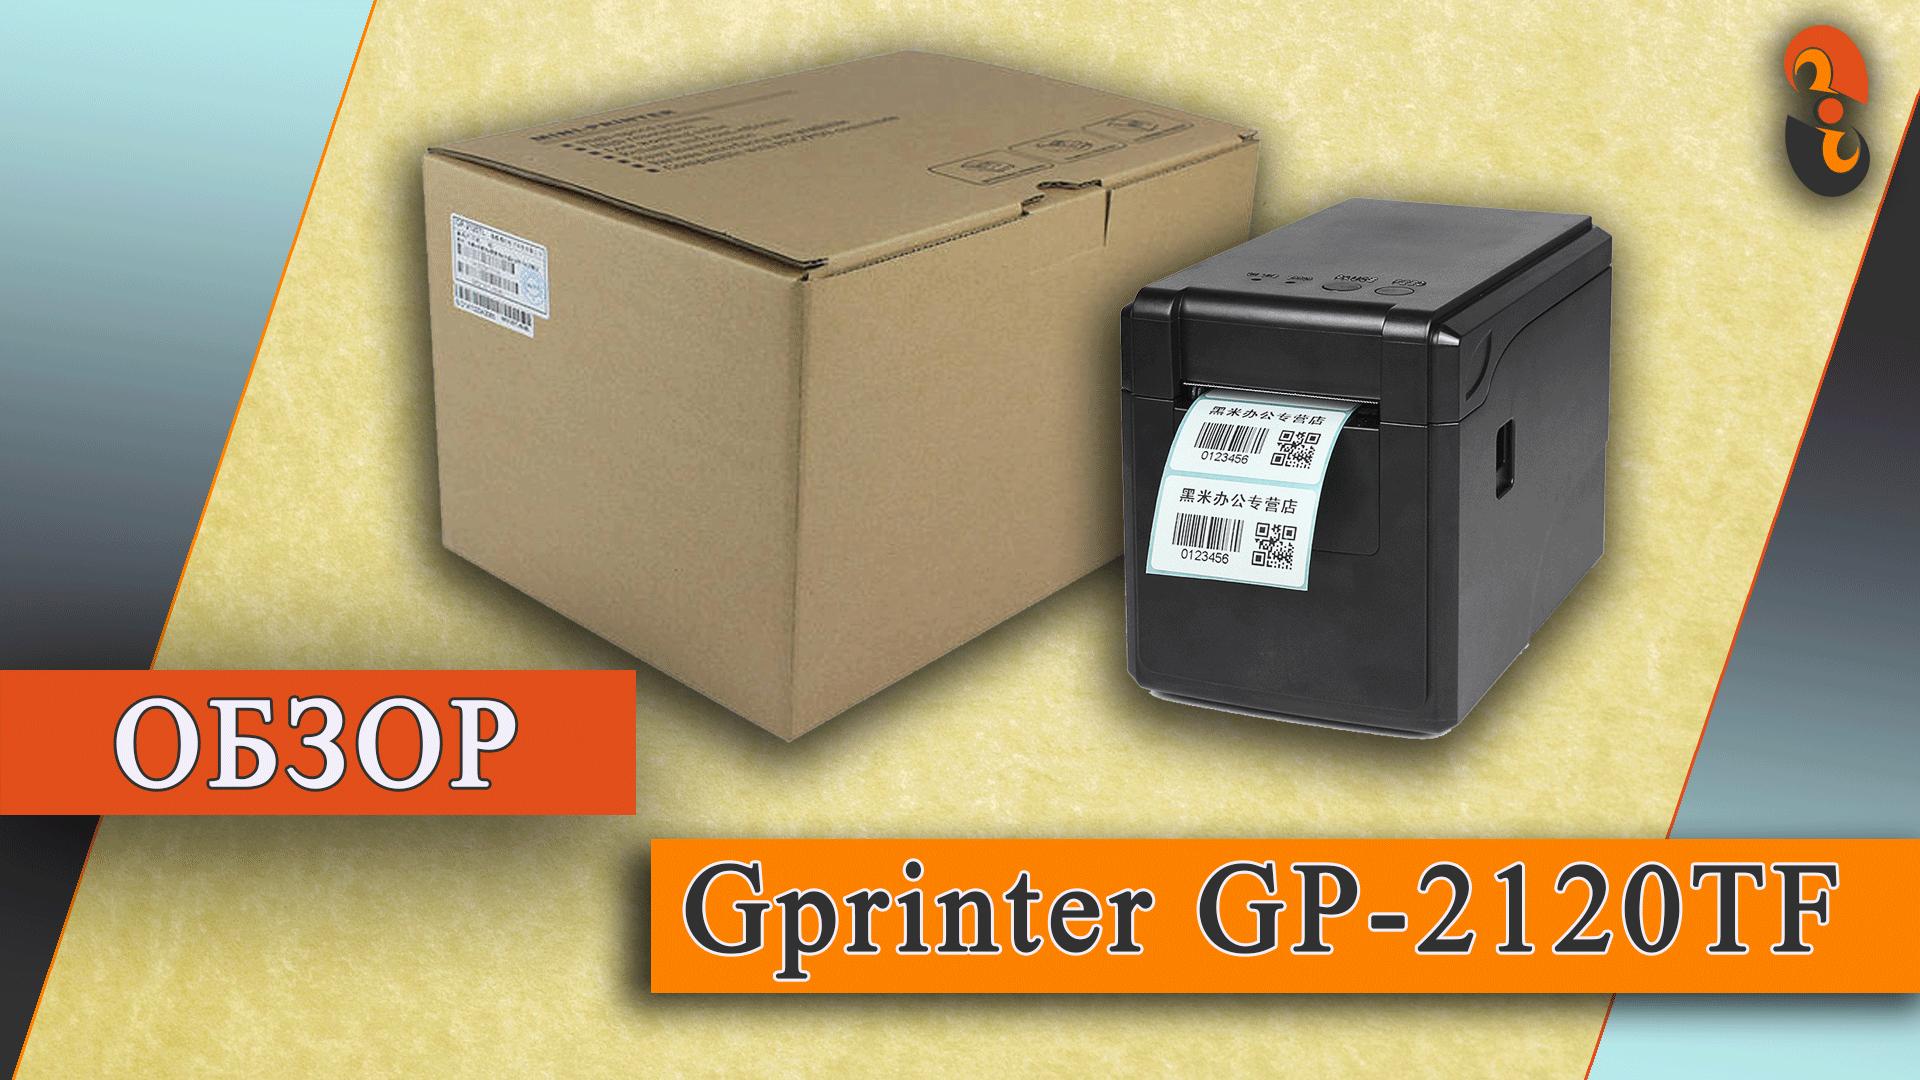 Видео обзор Принтера этикеток Gprinter GP-2120TF